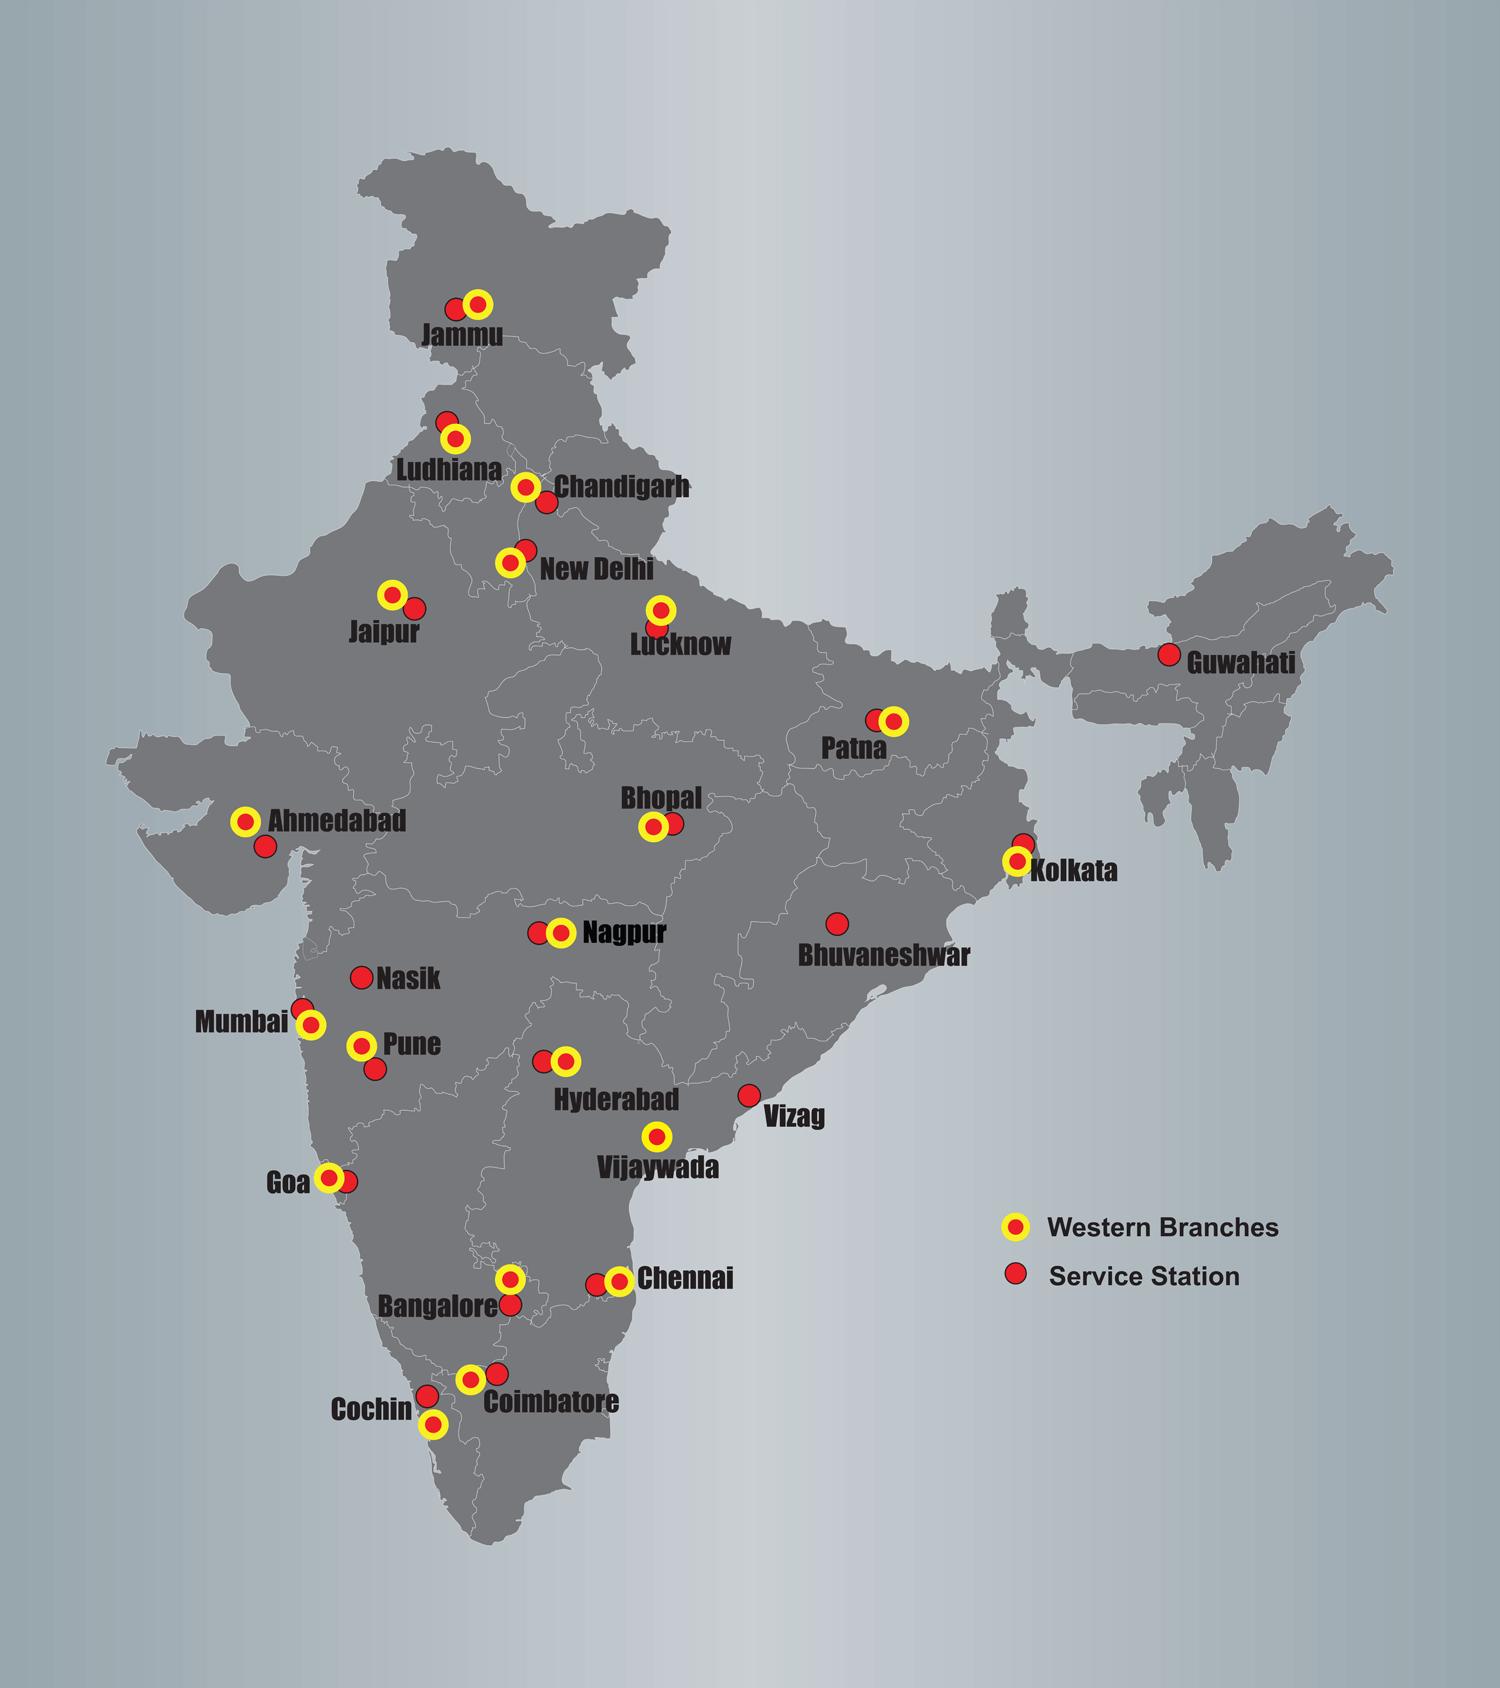 west price bhopal